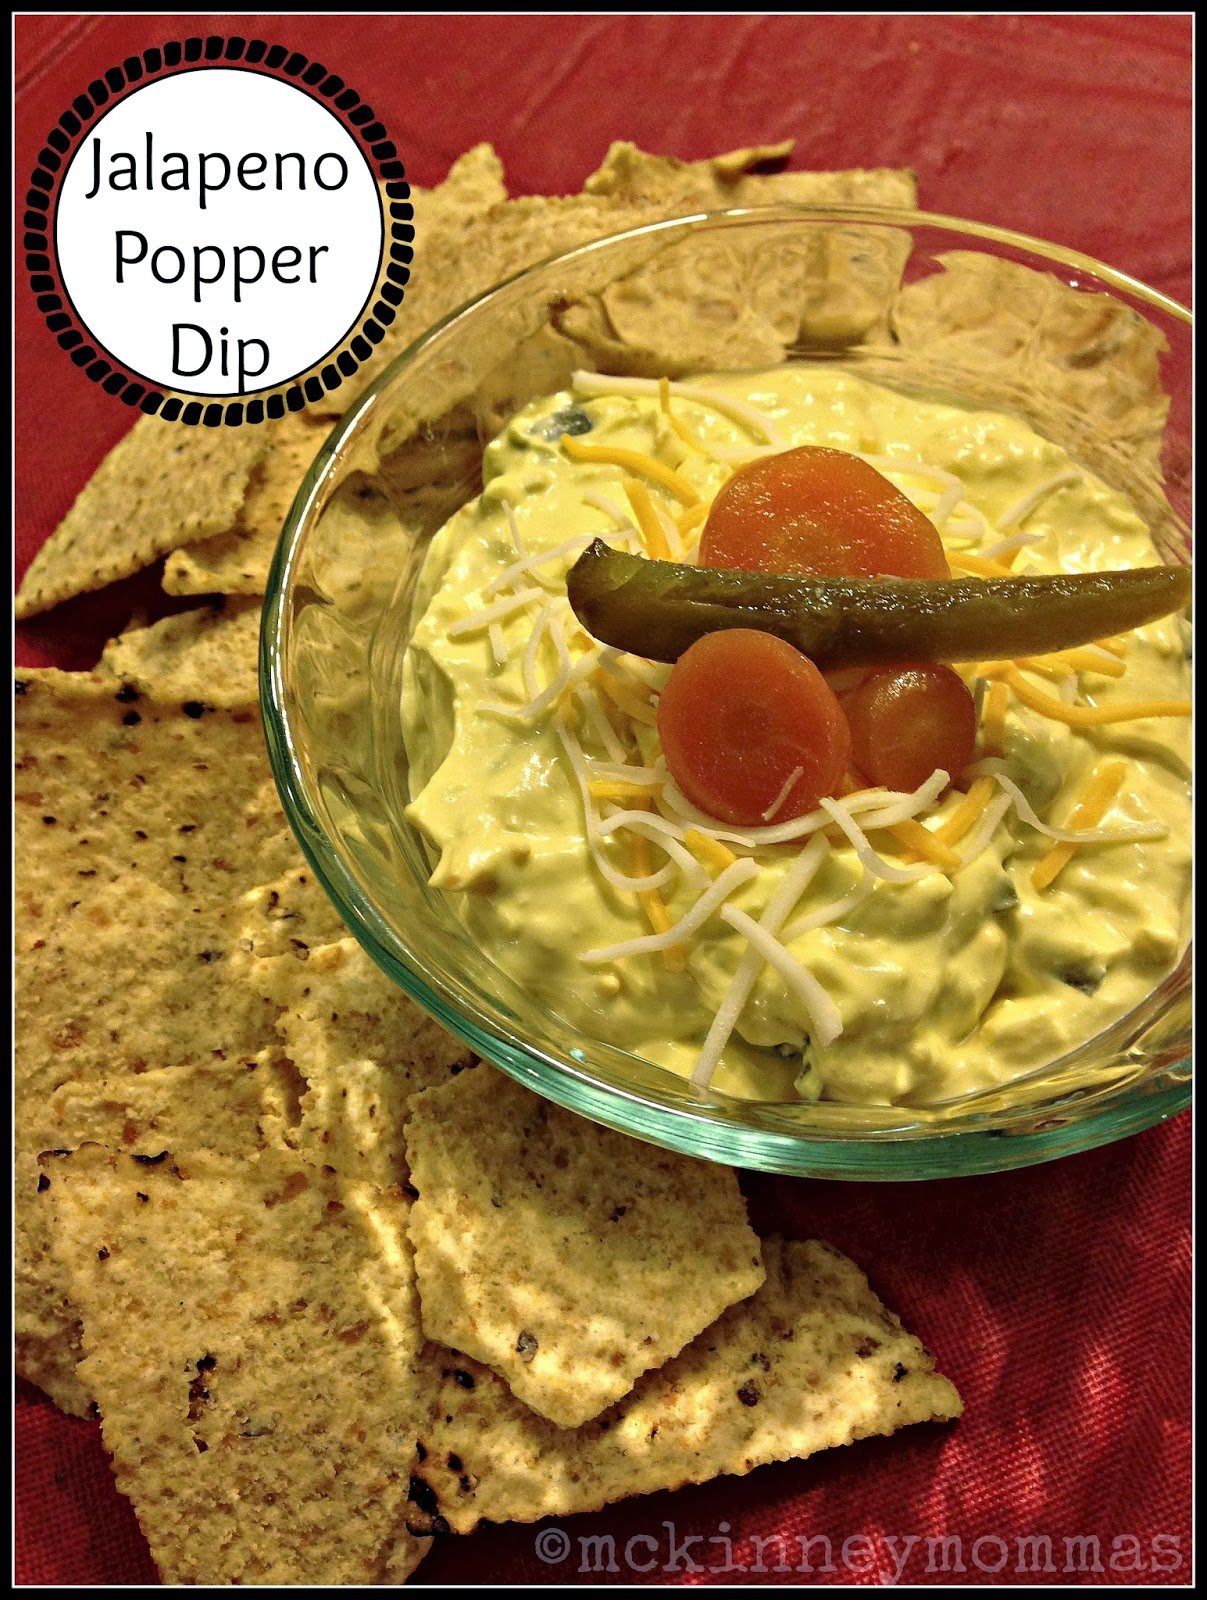 French's Mustard Jalapeno Popper Dip